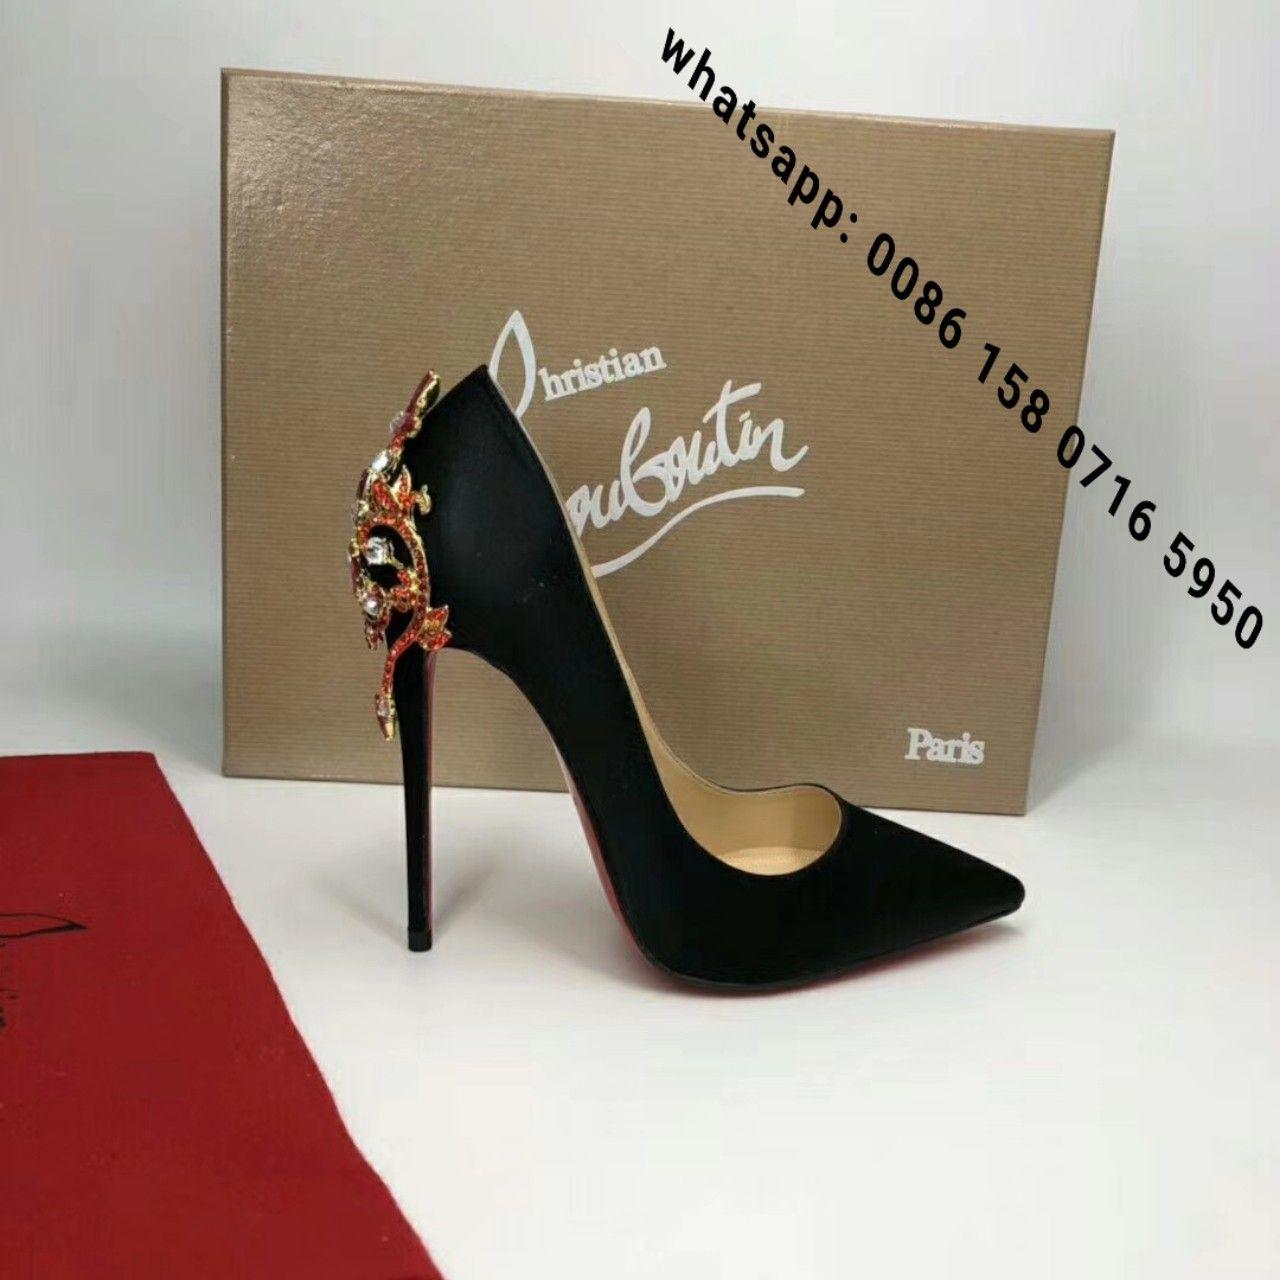 04586b86bdf christian louboutin red bottom shoes women, please contact me when ...